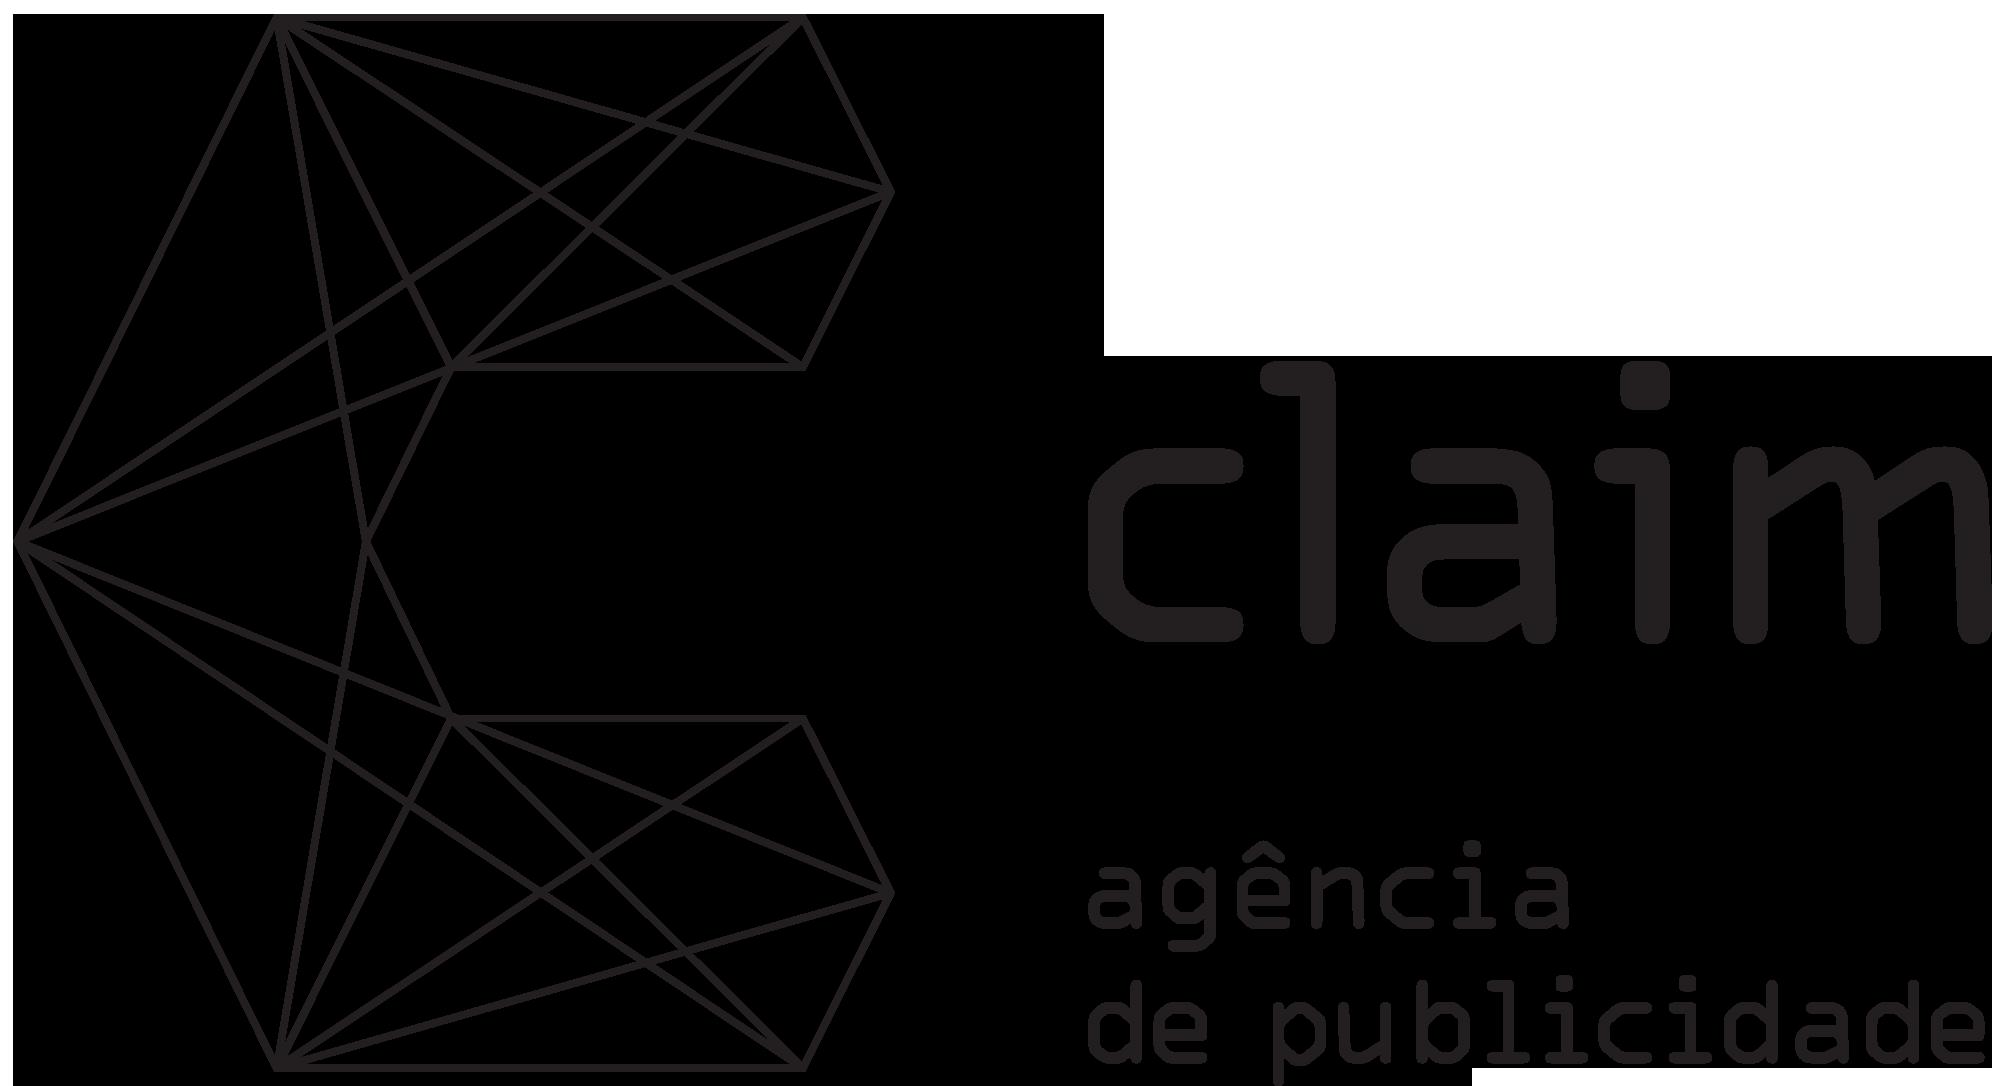 LogoClaimcomassinatura2